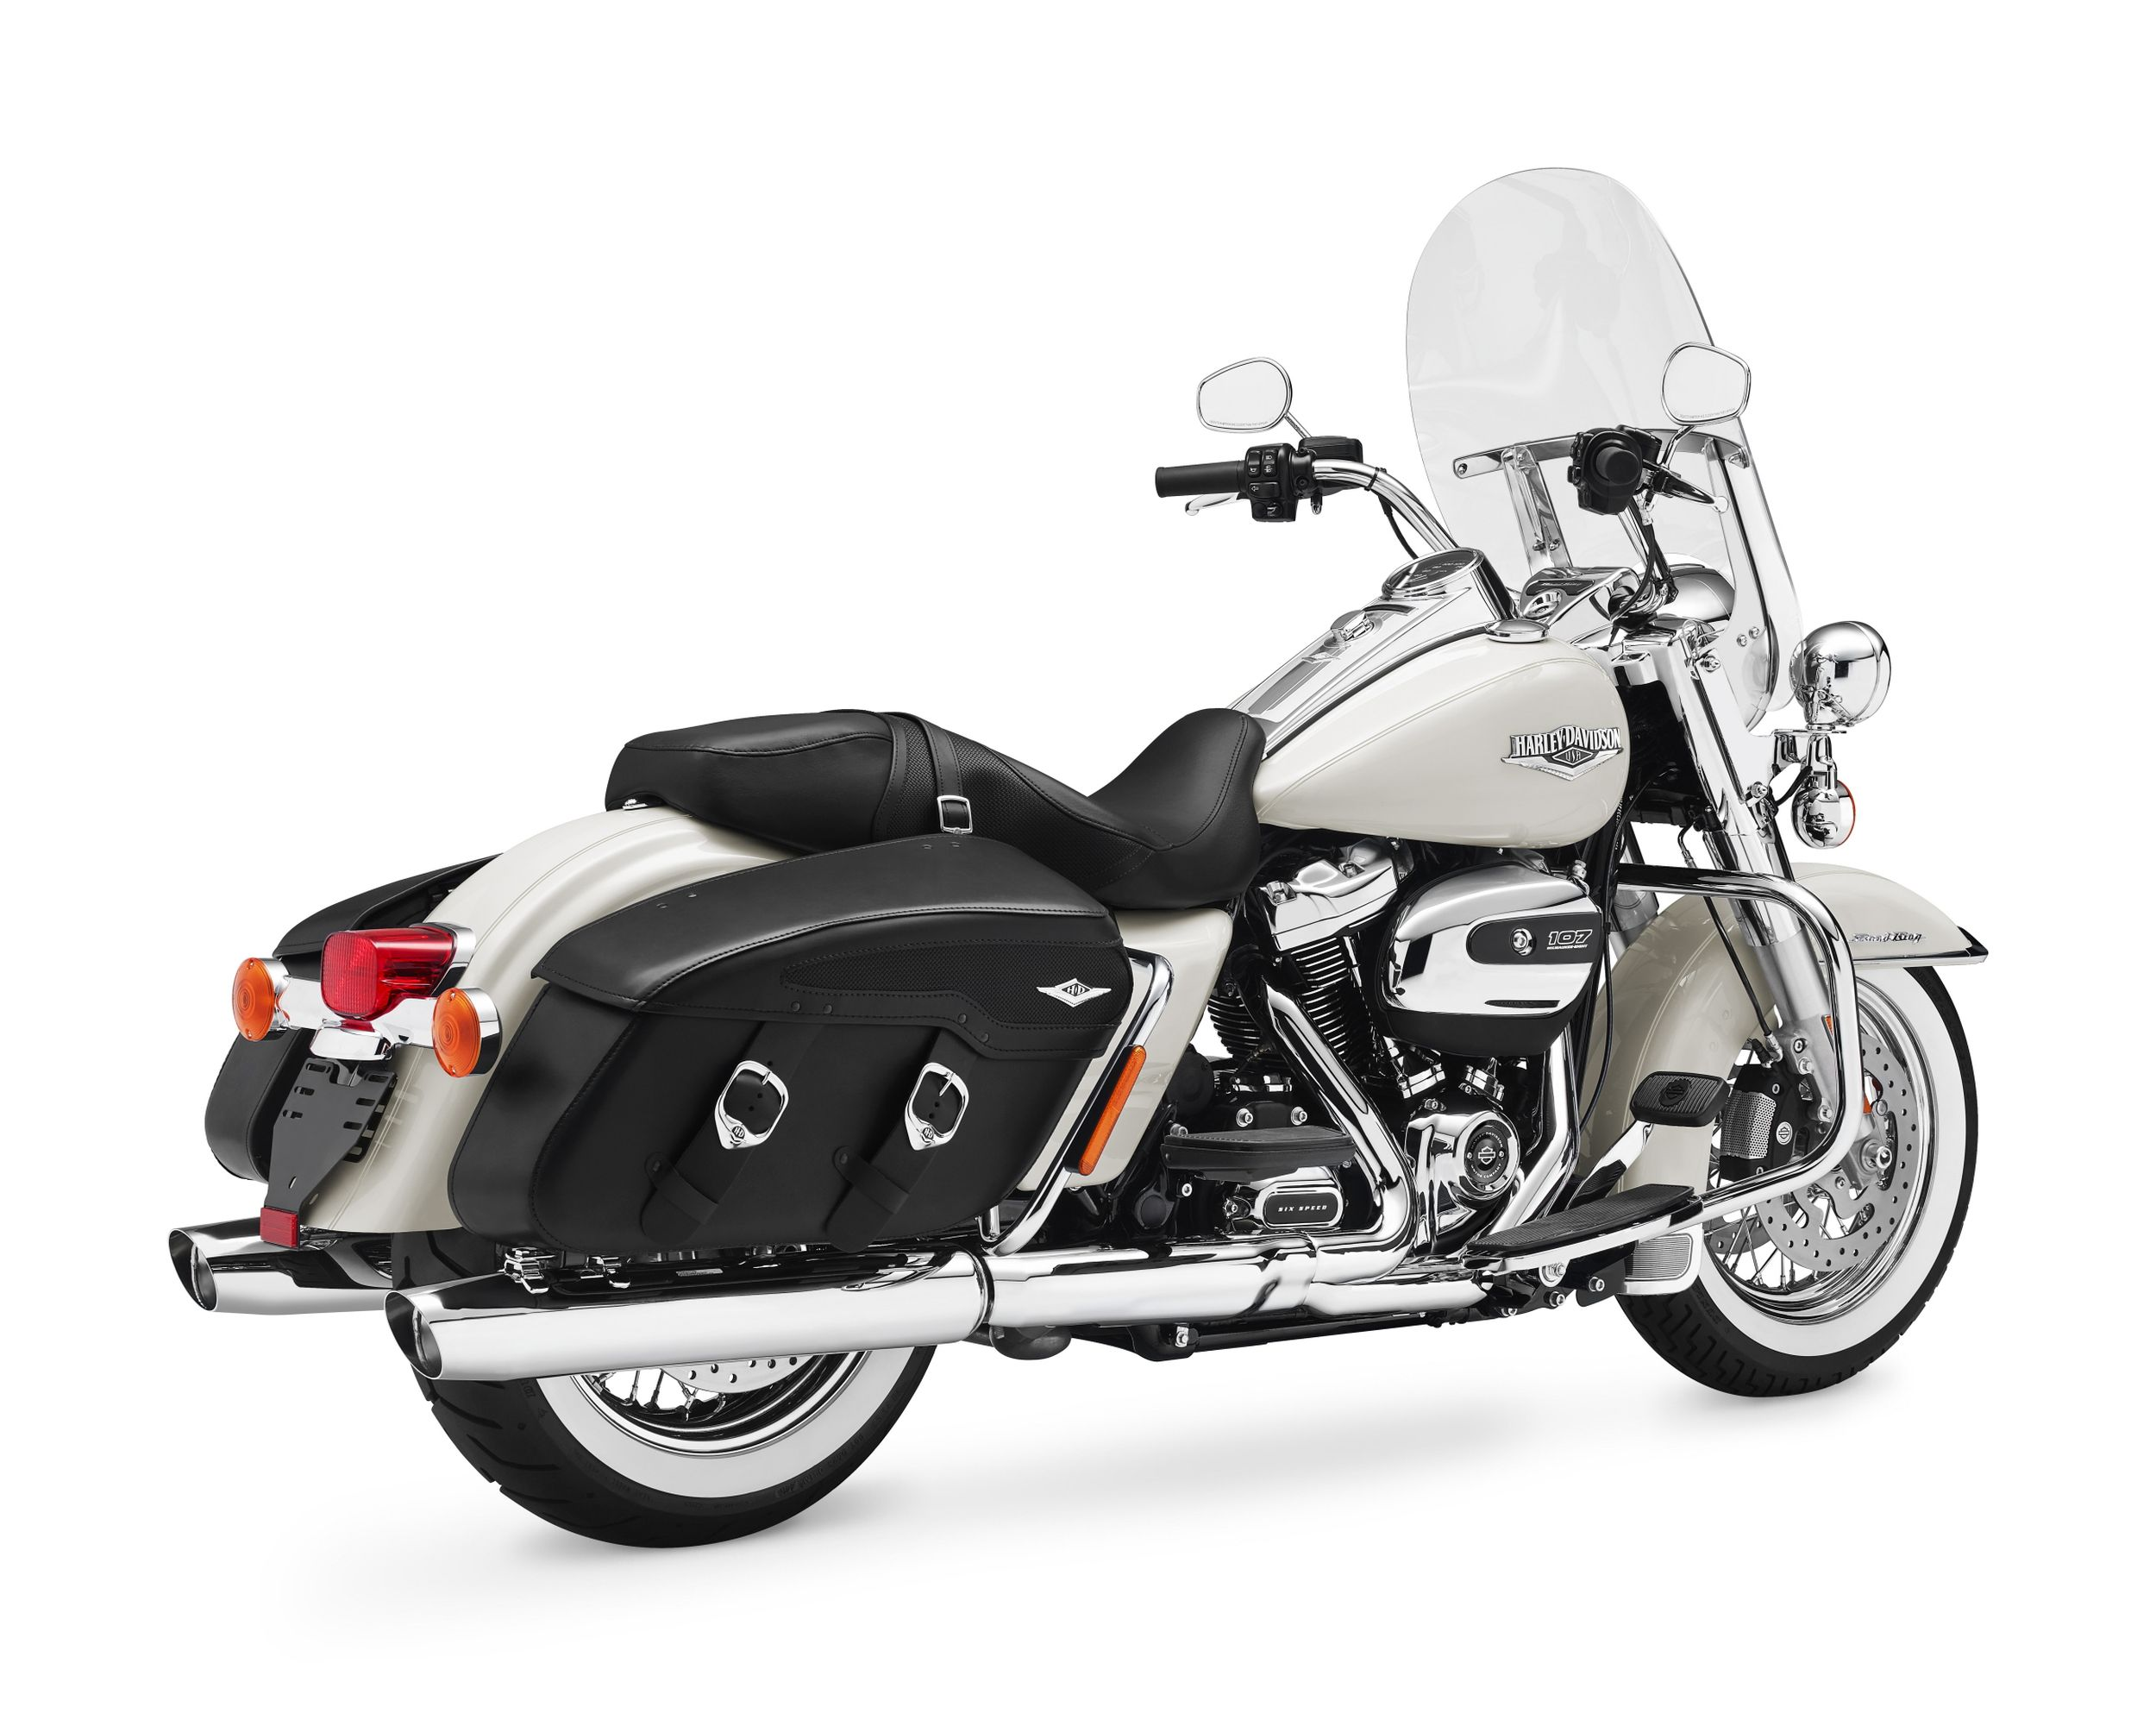 Harley Davidson Screamin Eagle Street Glide